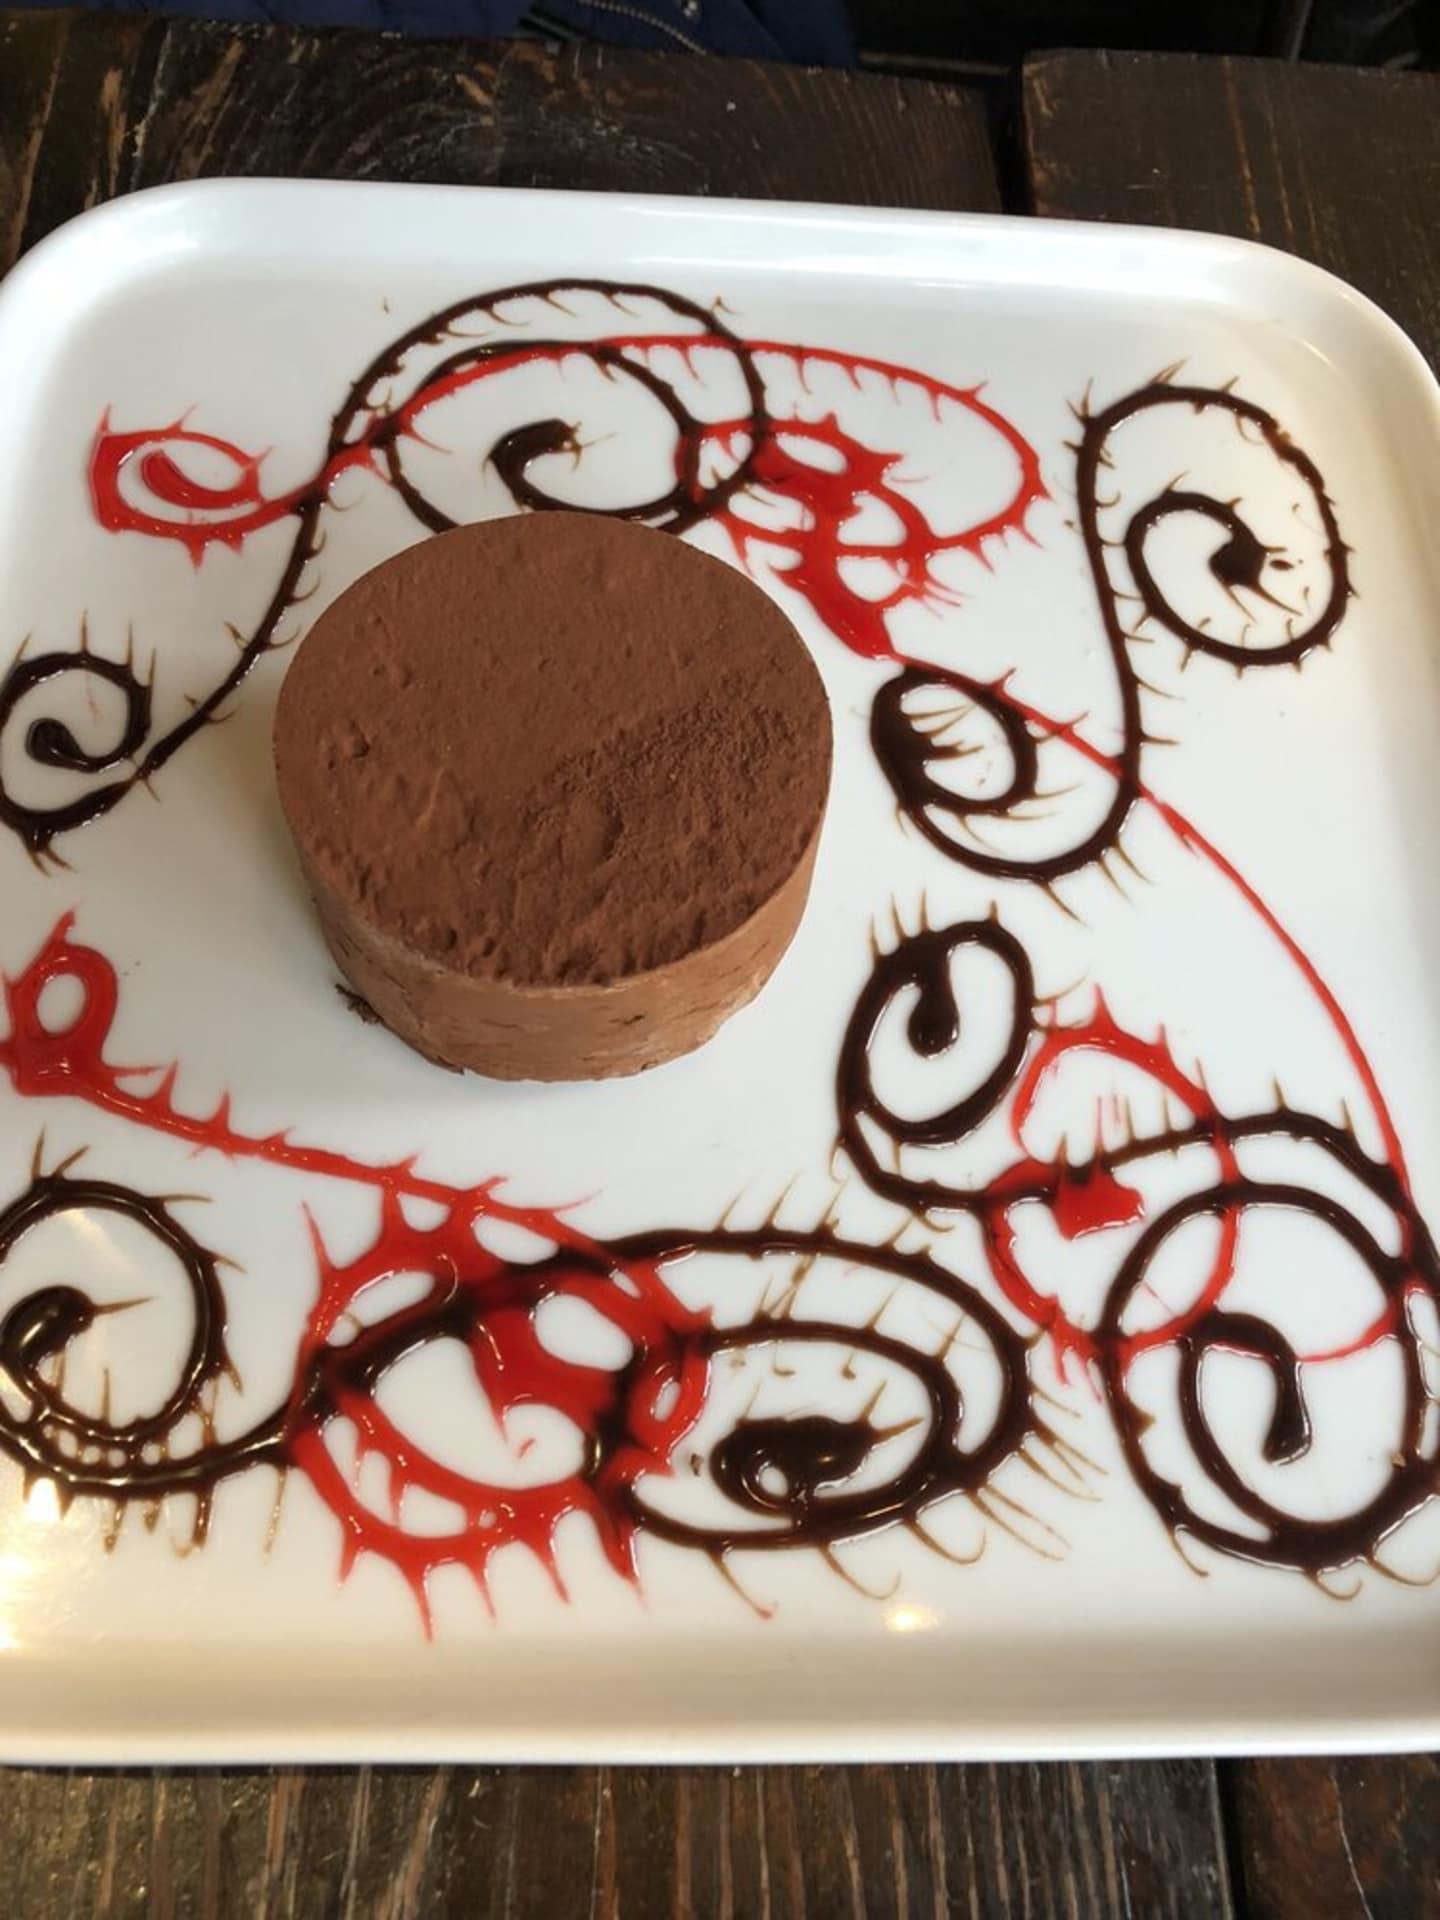 CHOCOLATE TRUFFLE MOUSE